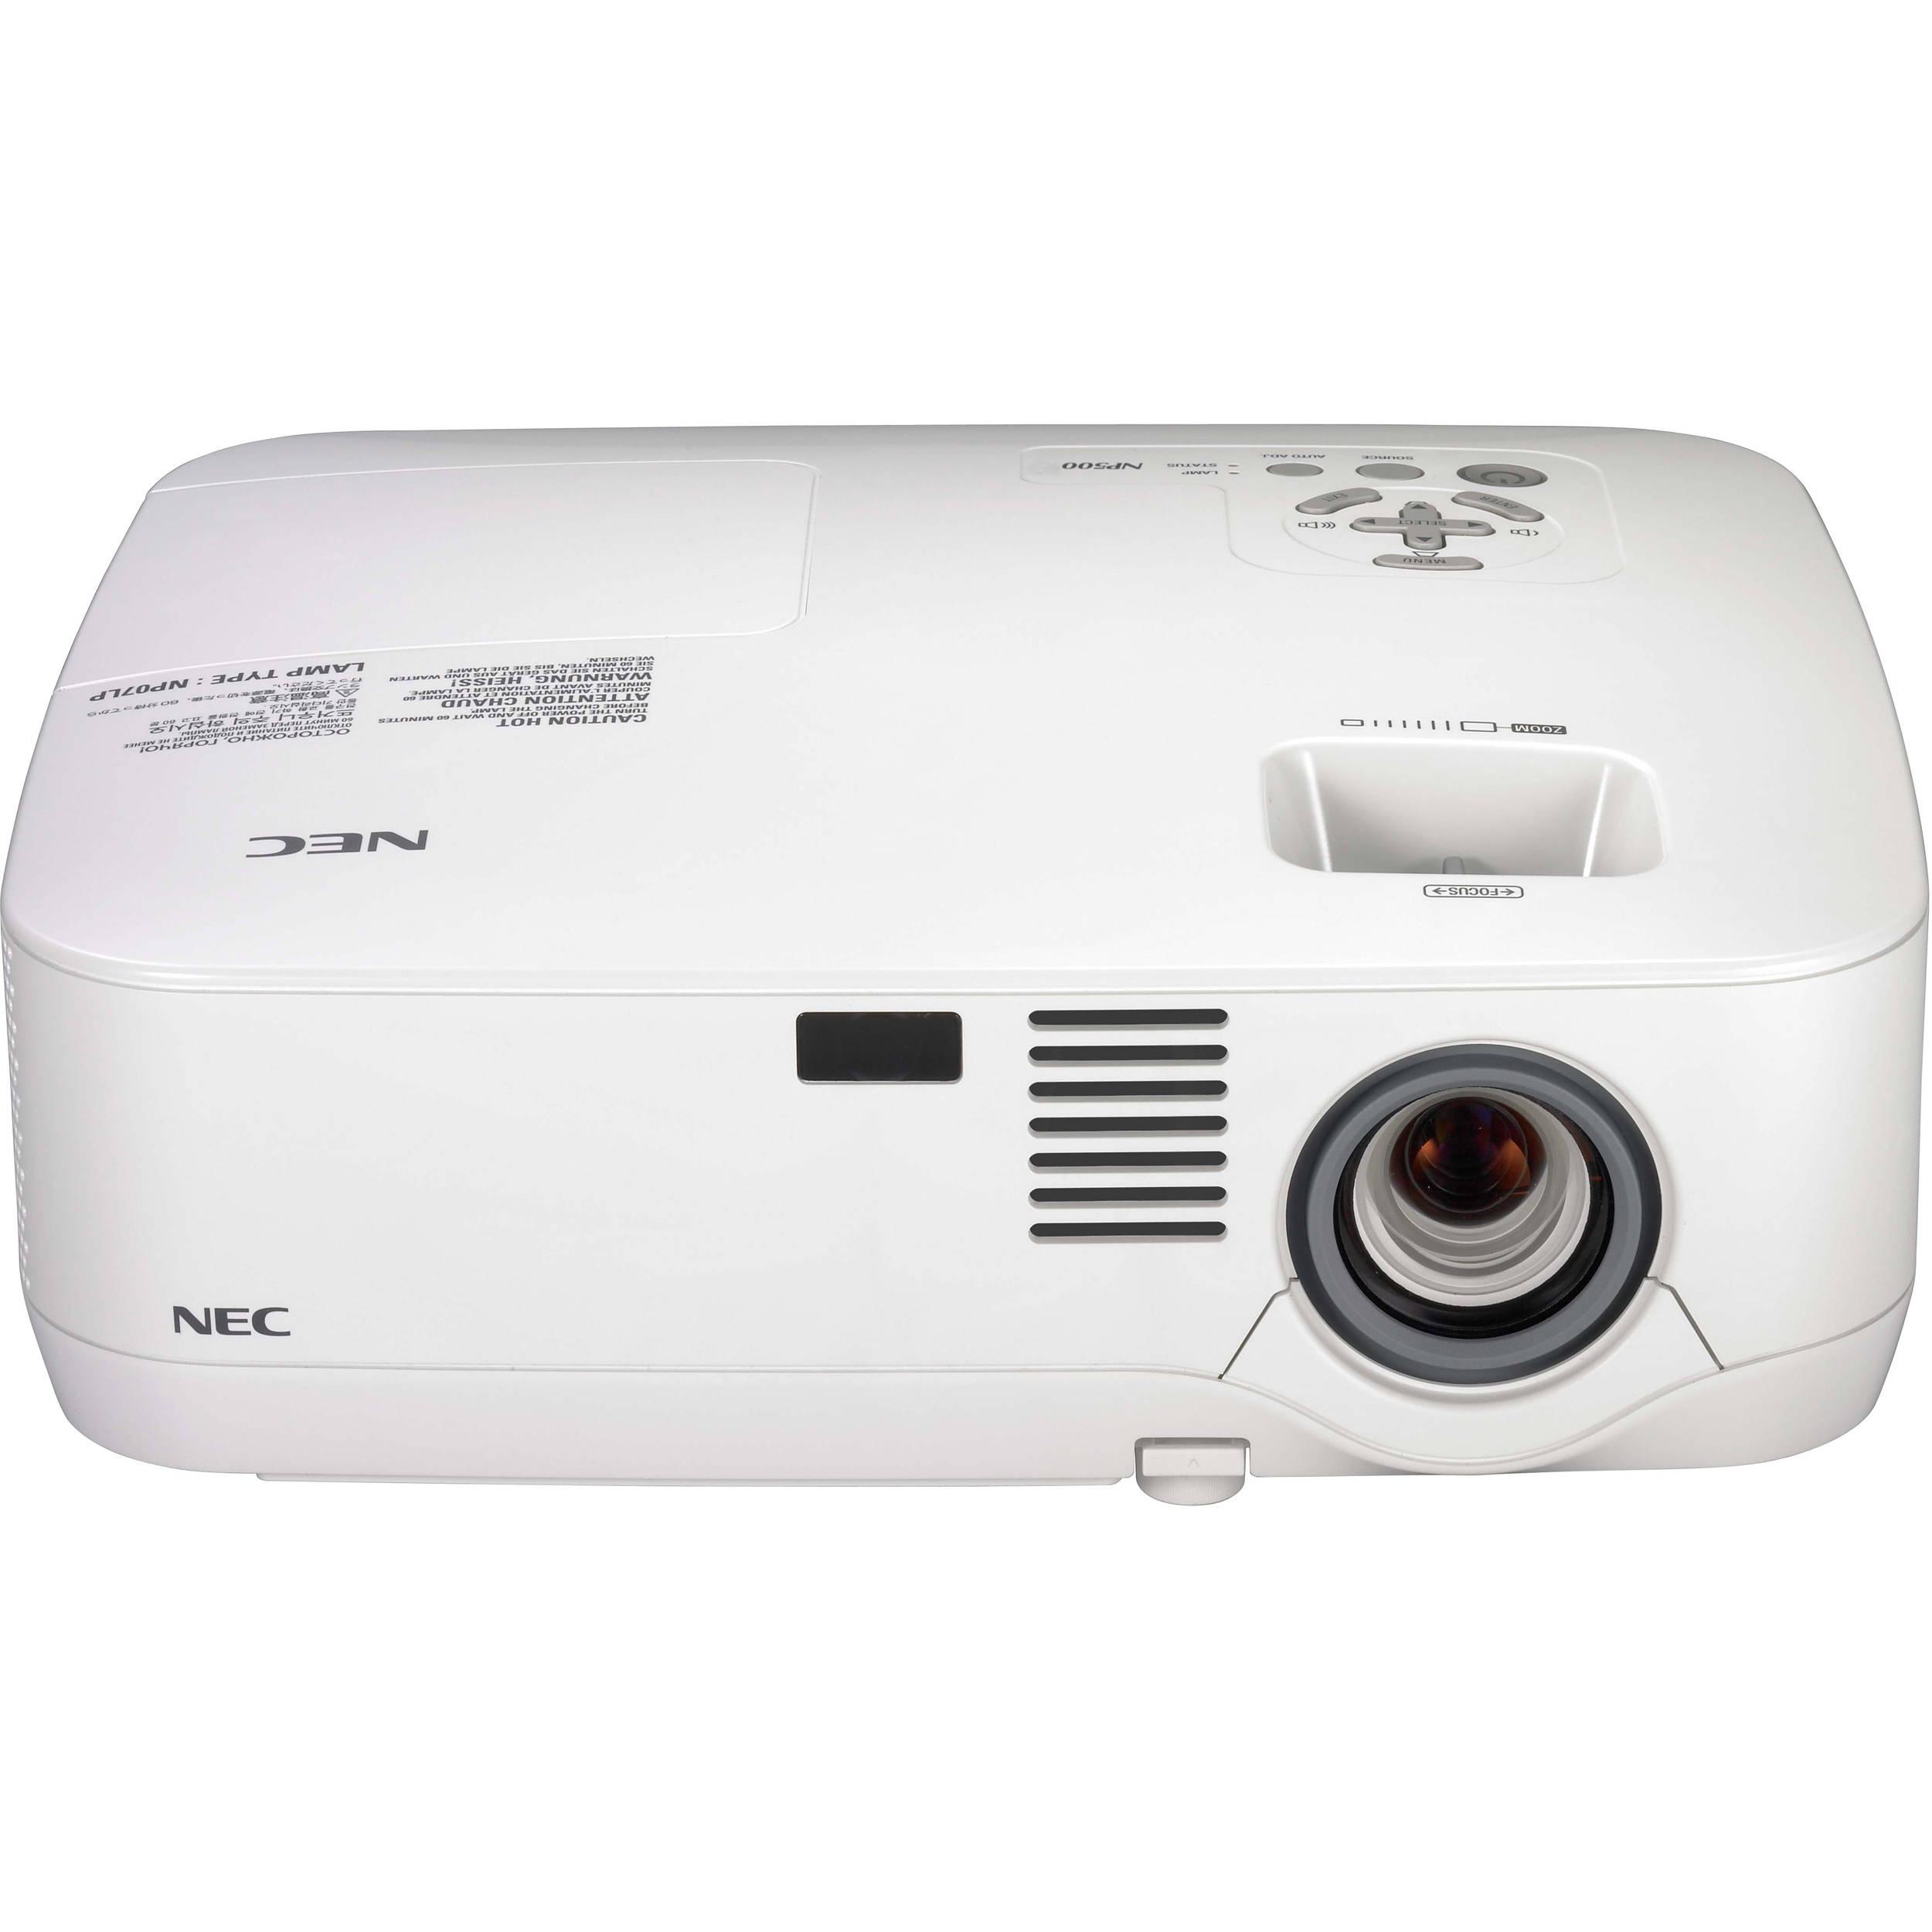 nec np500 lcd xga 3000 lumens projector np500 b h photo video rh bhphotovideo com nec lcd 4000 manual NEC 3000 LCD